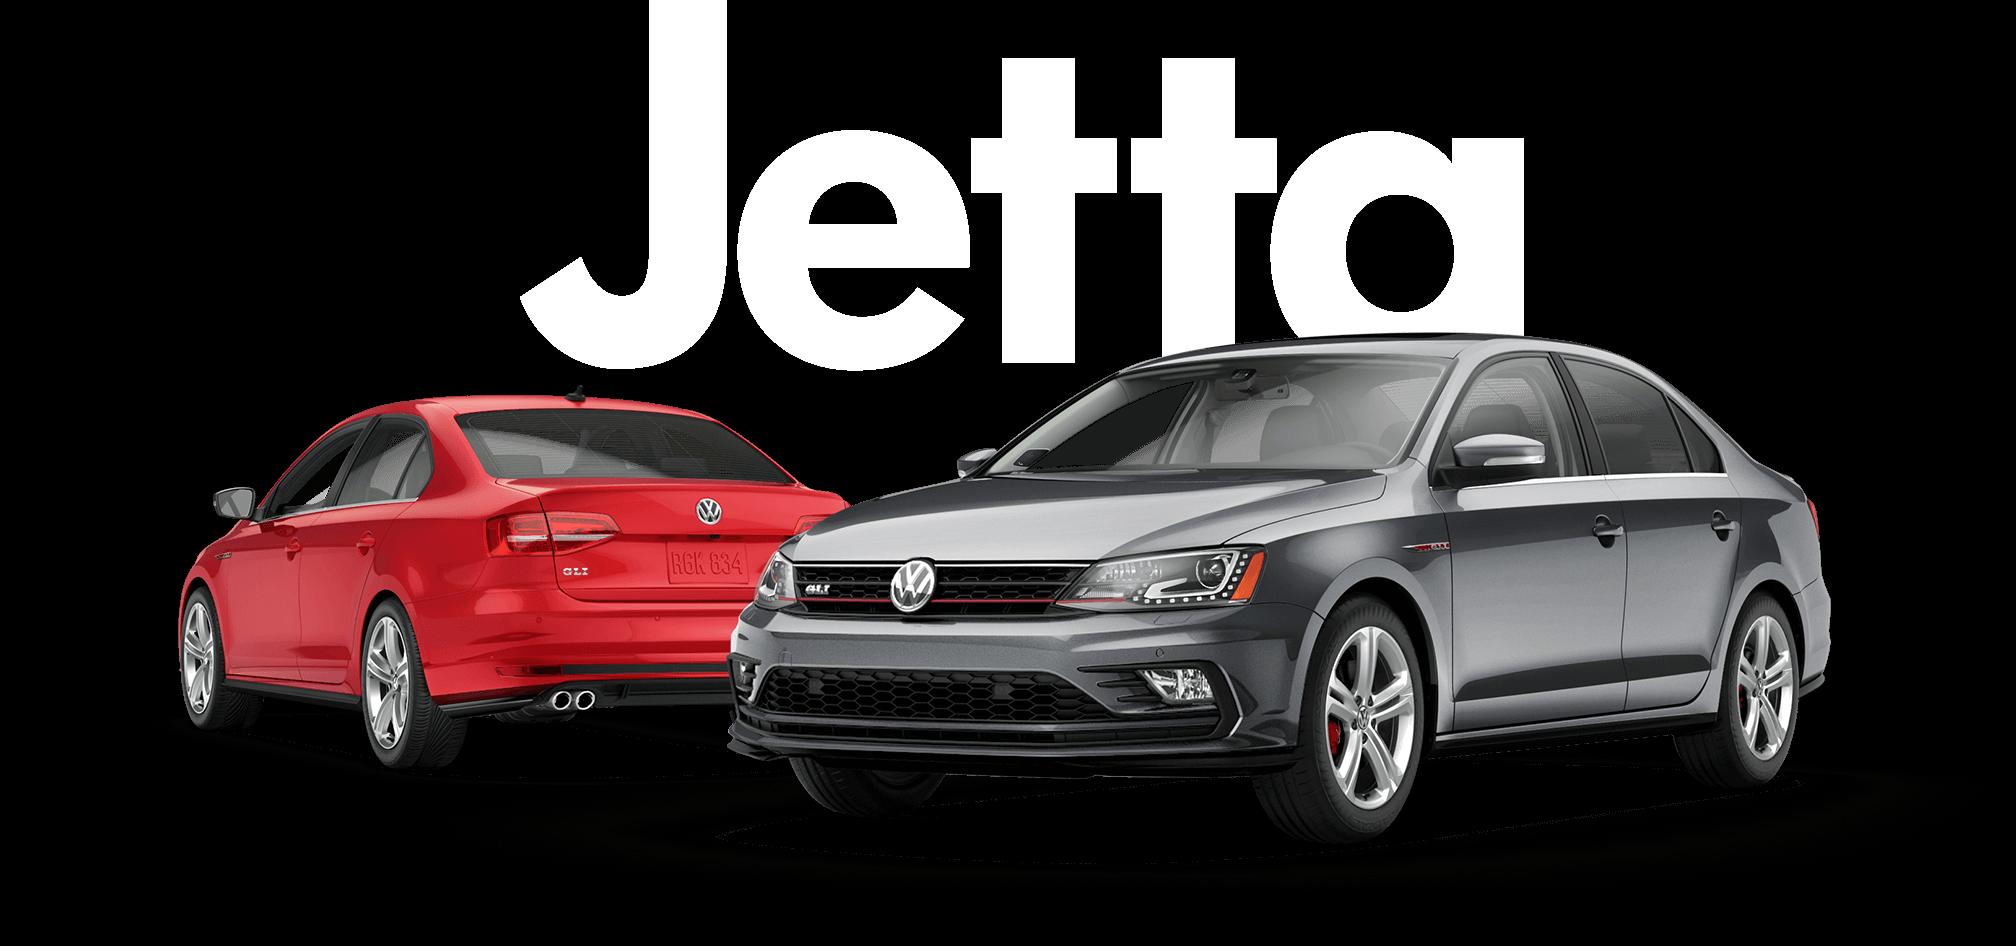 New 2017 VW Jetta in Cicero New York